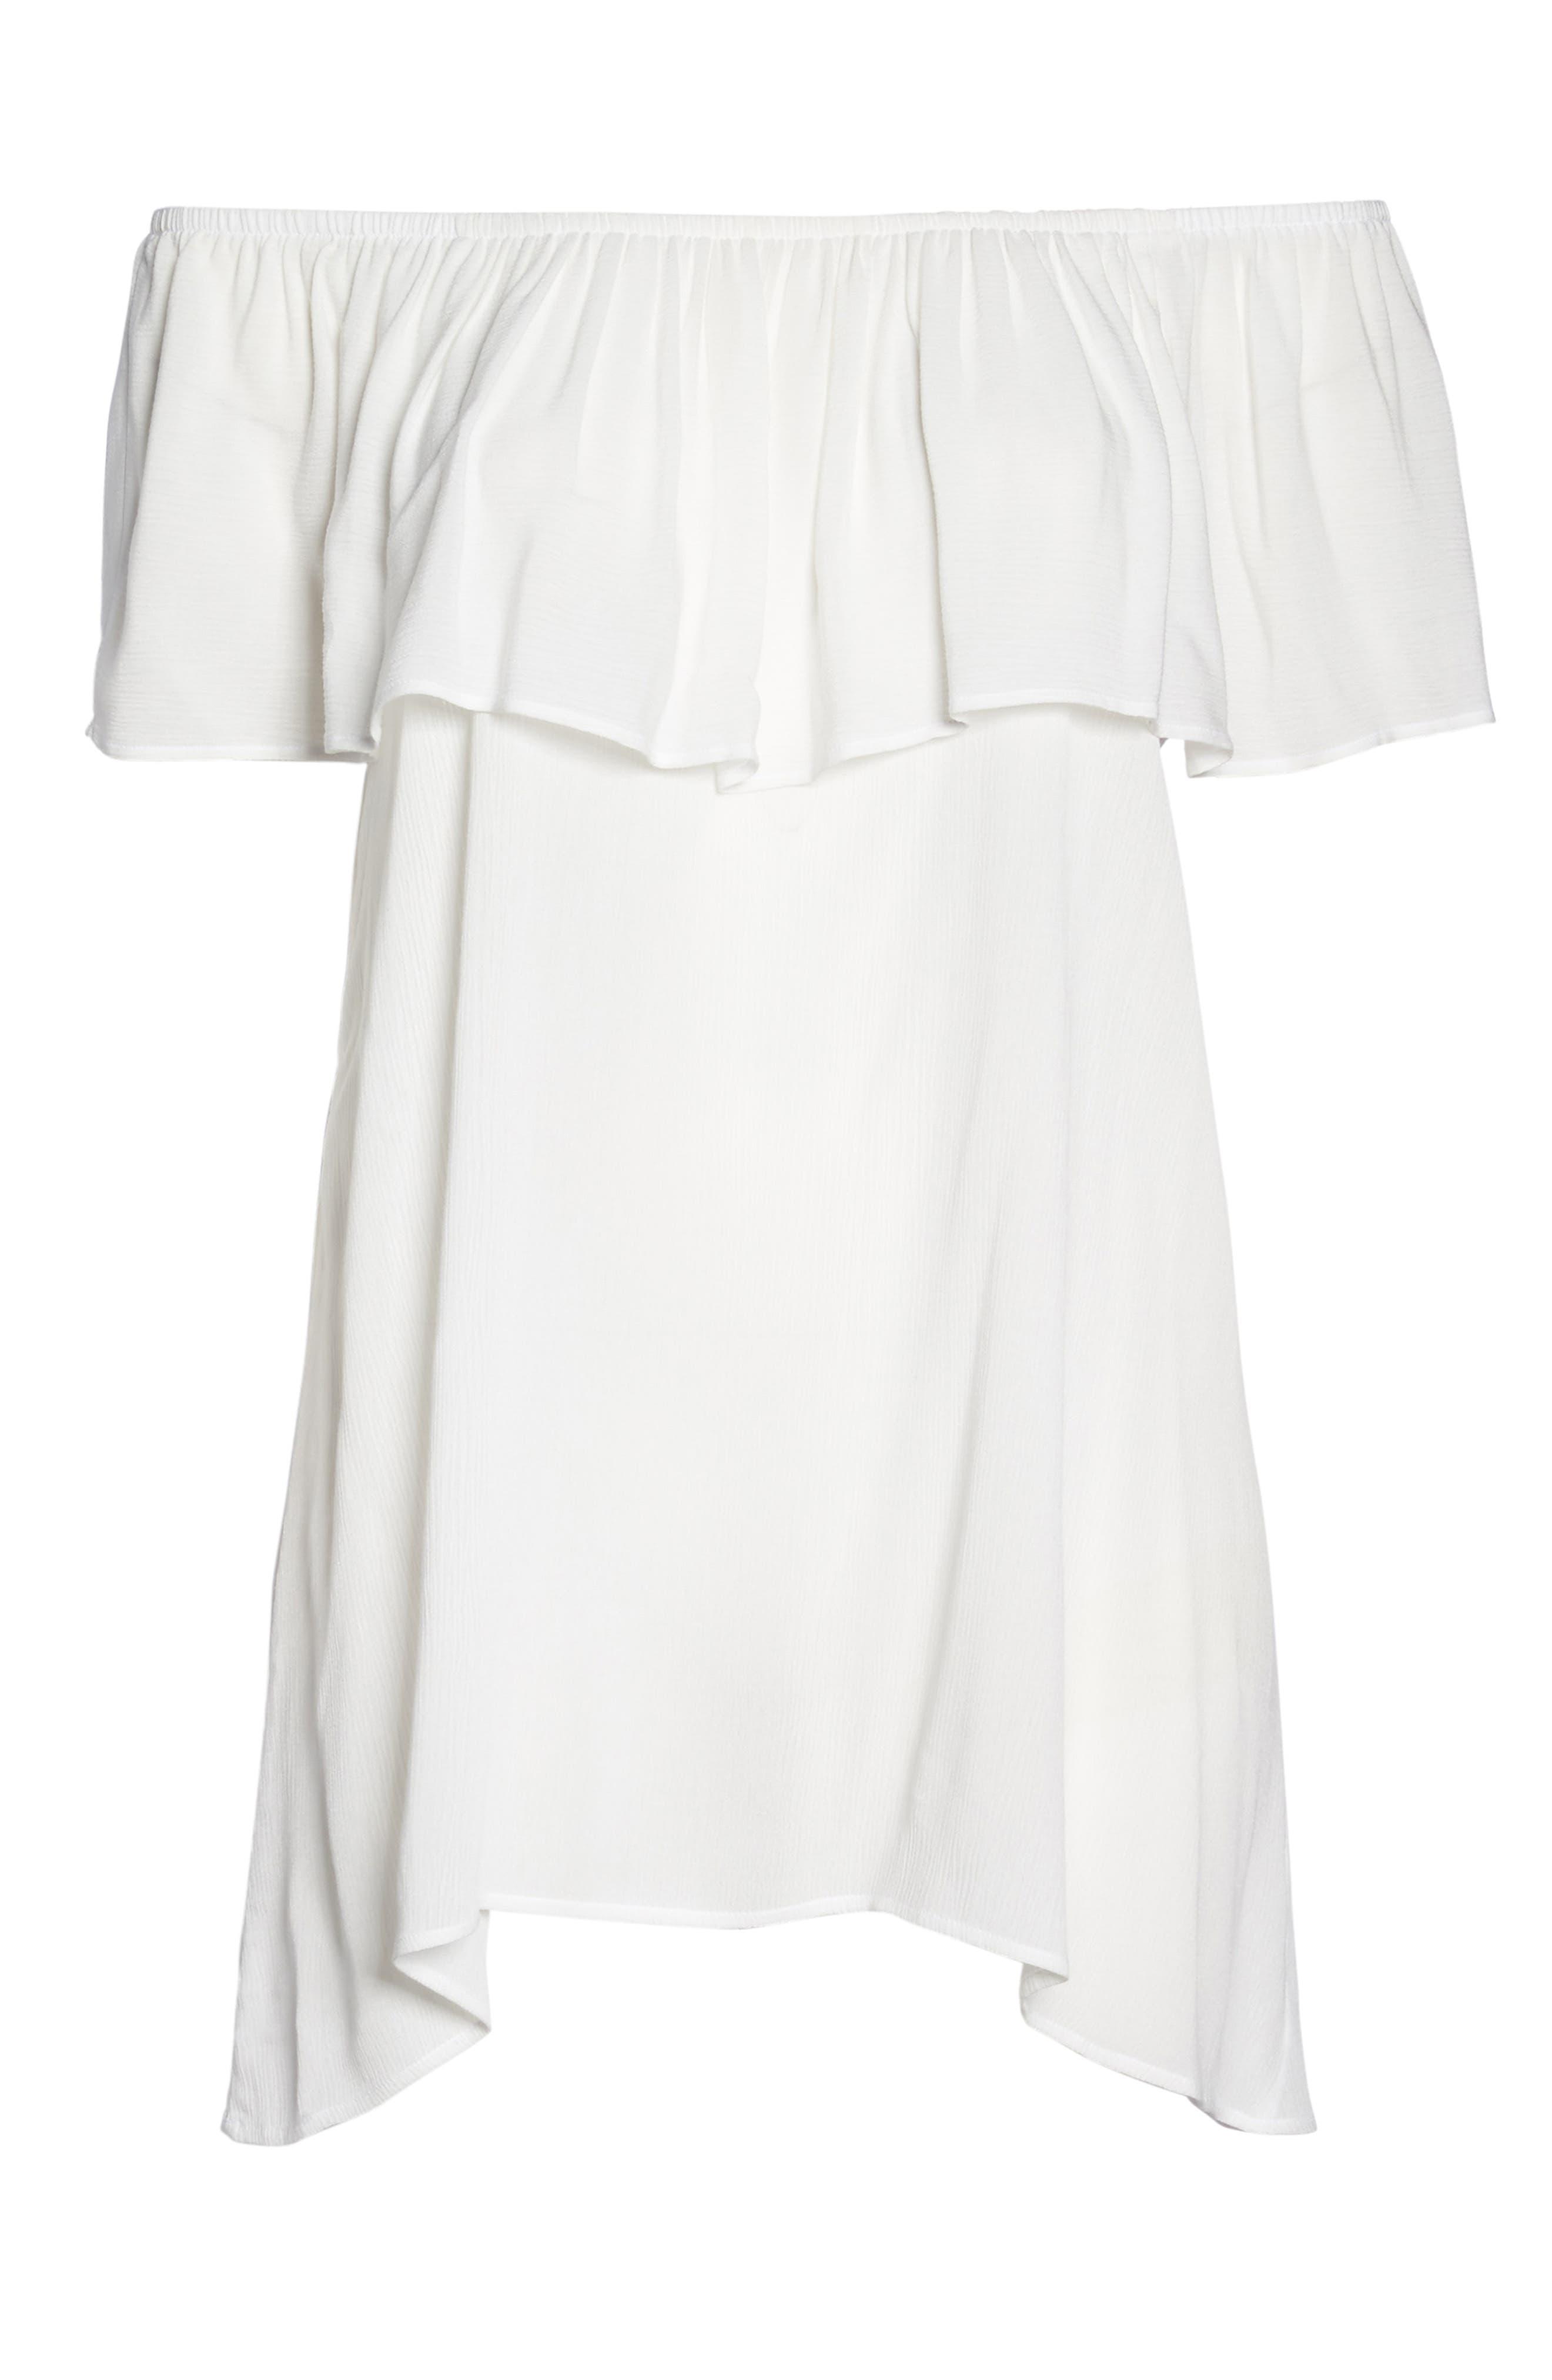 Southern Belle Off the Shoulder Cover-Up Dress,                             Alternate thumbnail 12, color,